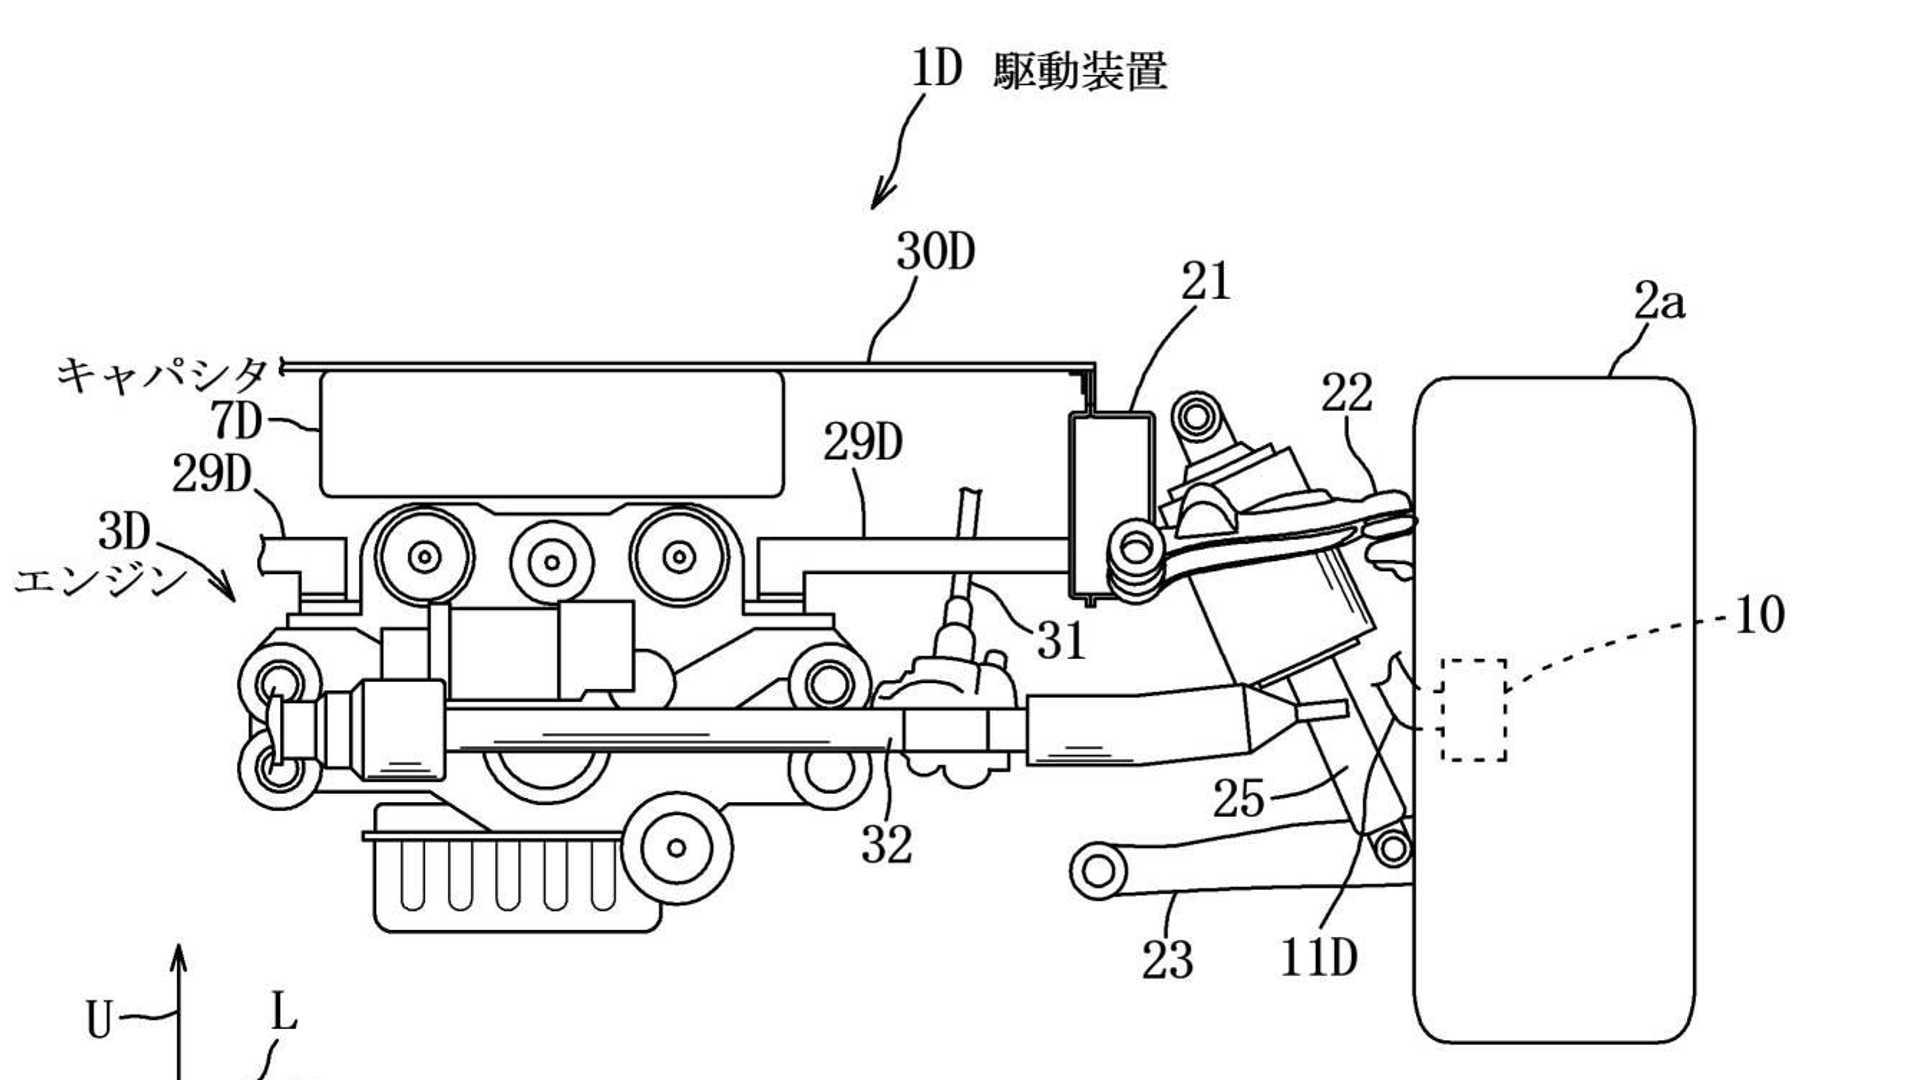 Mazda-Rotary-Engine-Hybrid-Patent-11